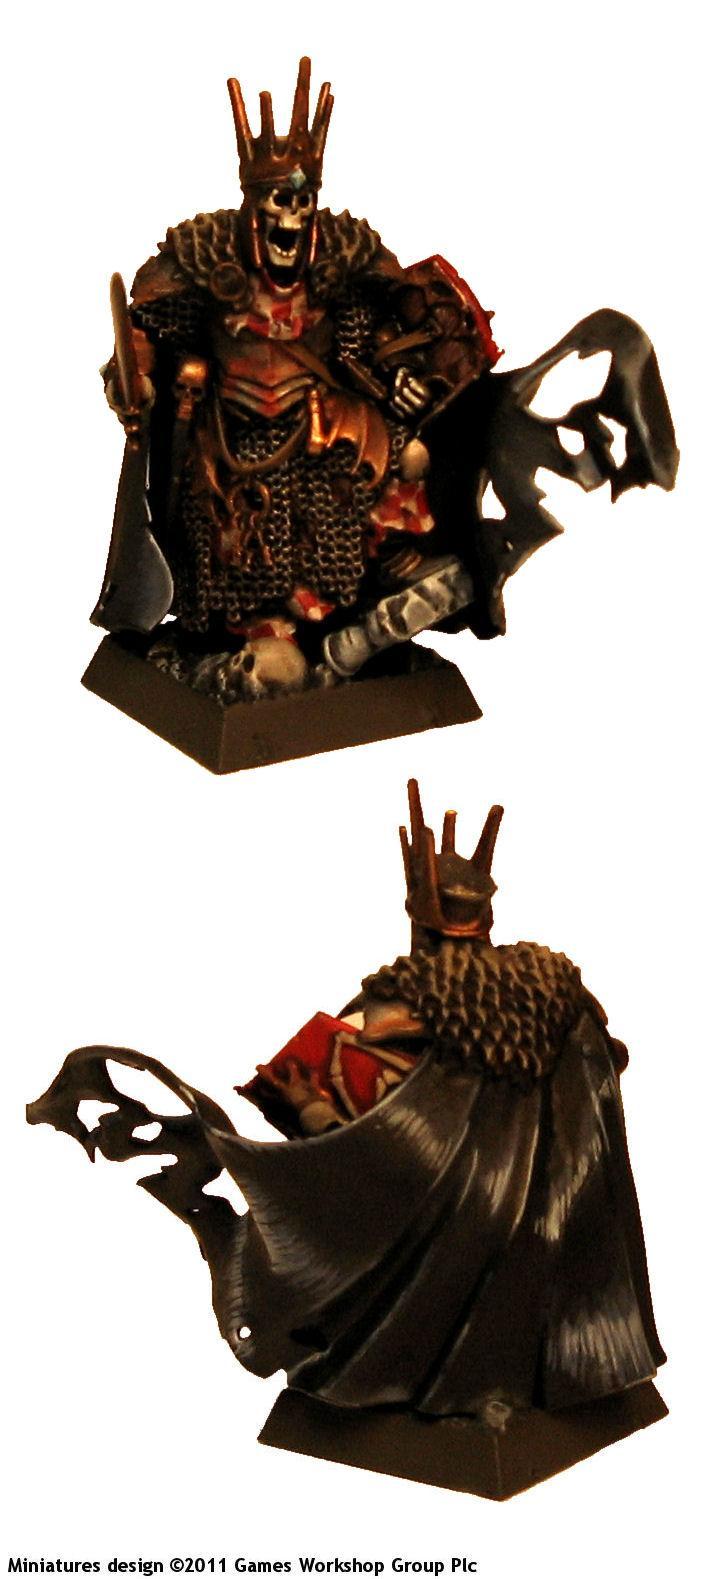 Cult, Dragon, Dungeons, King, Lich, Liche, Omega, Orcus, Precinct, Undead, Warhammer Fantasy